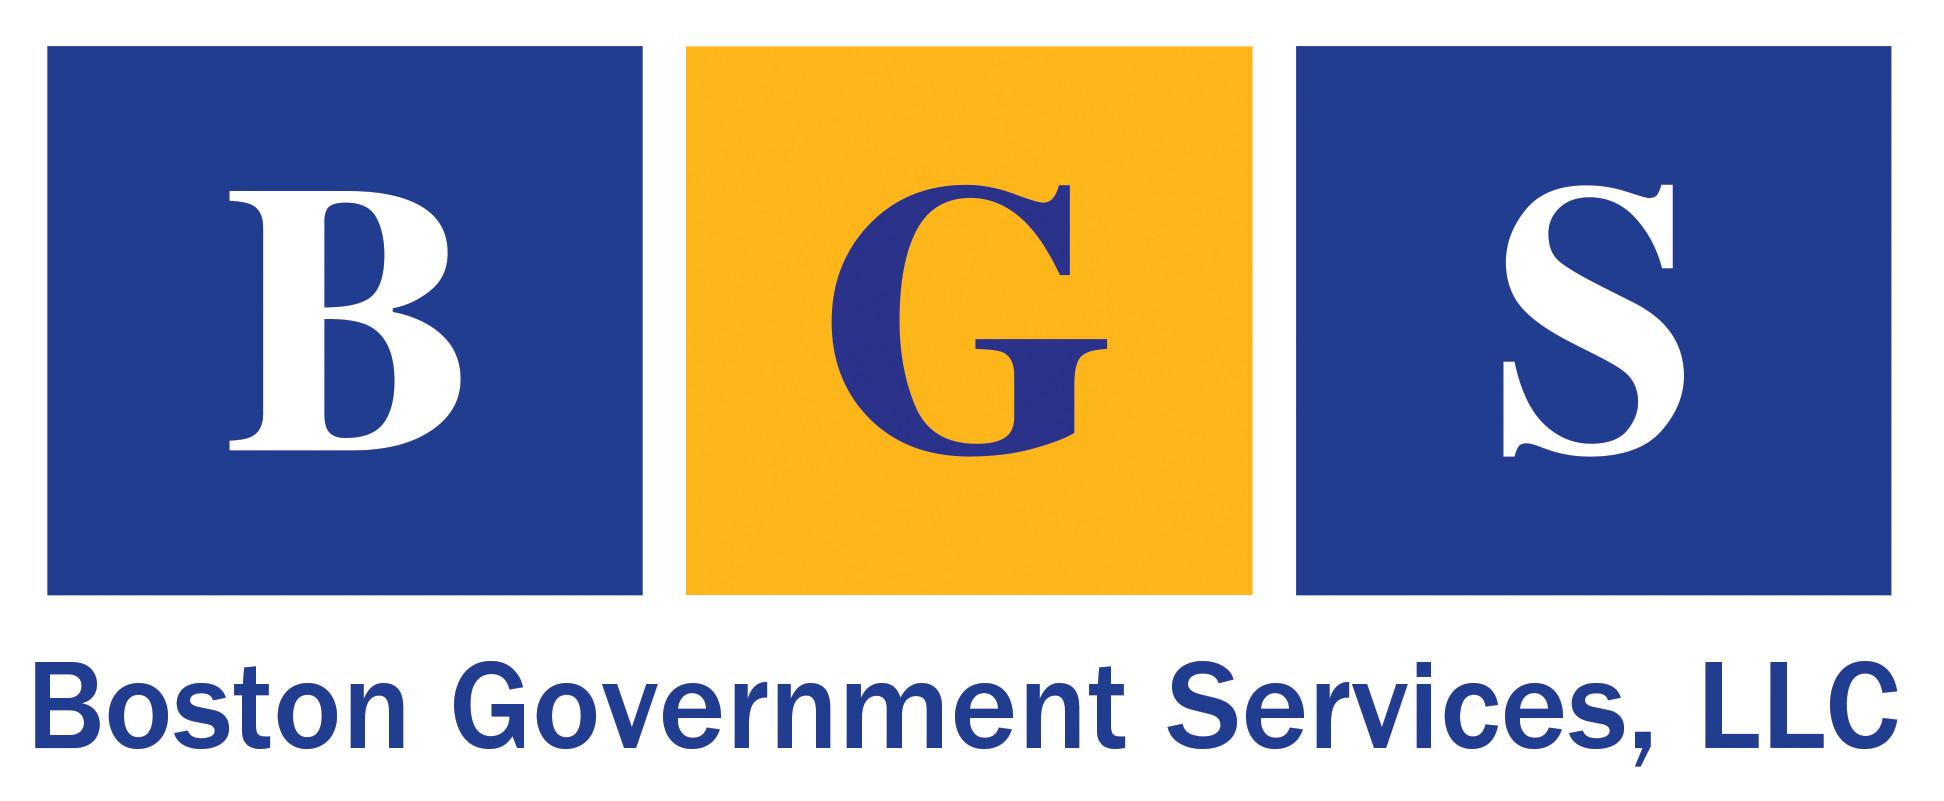 BGS logo (new 11-13).jpg